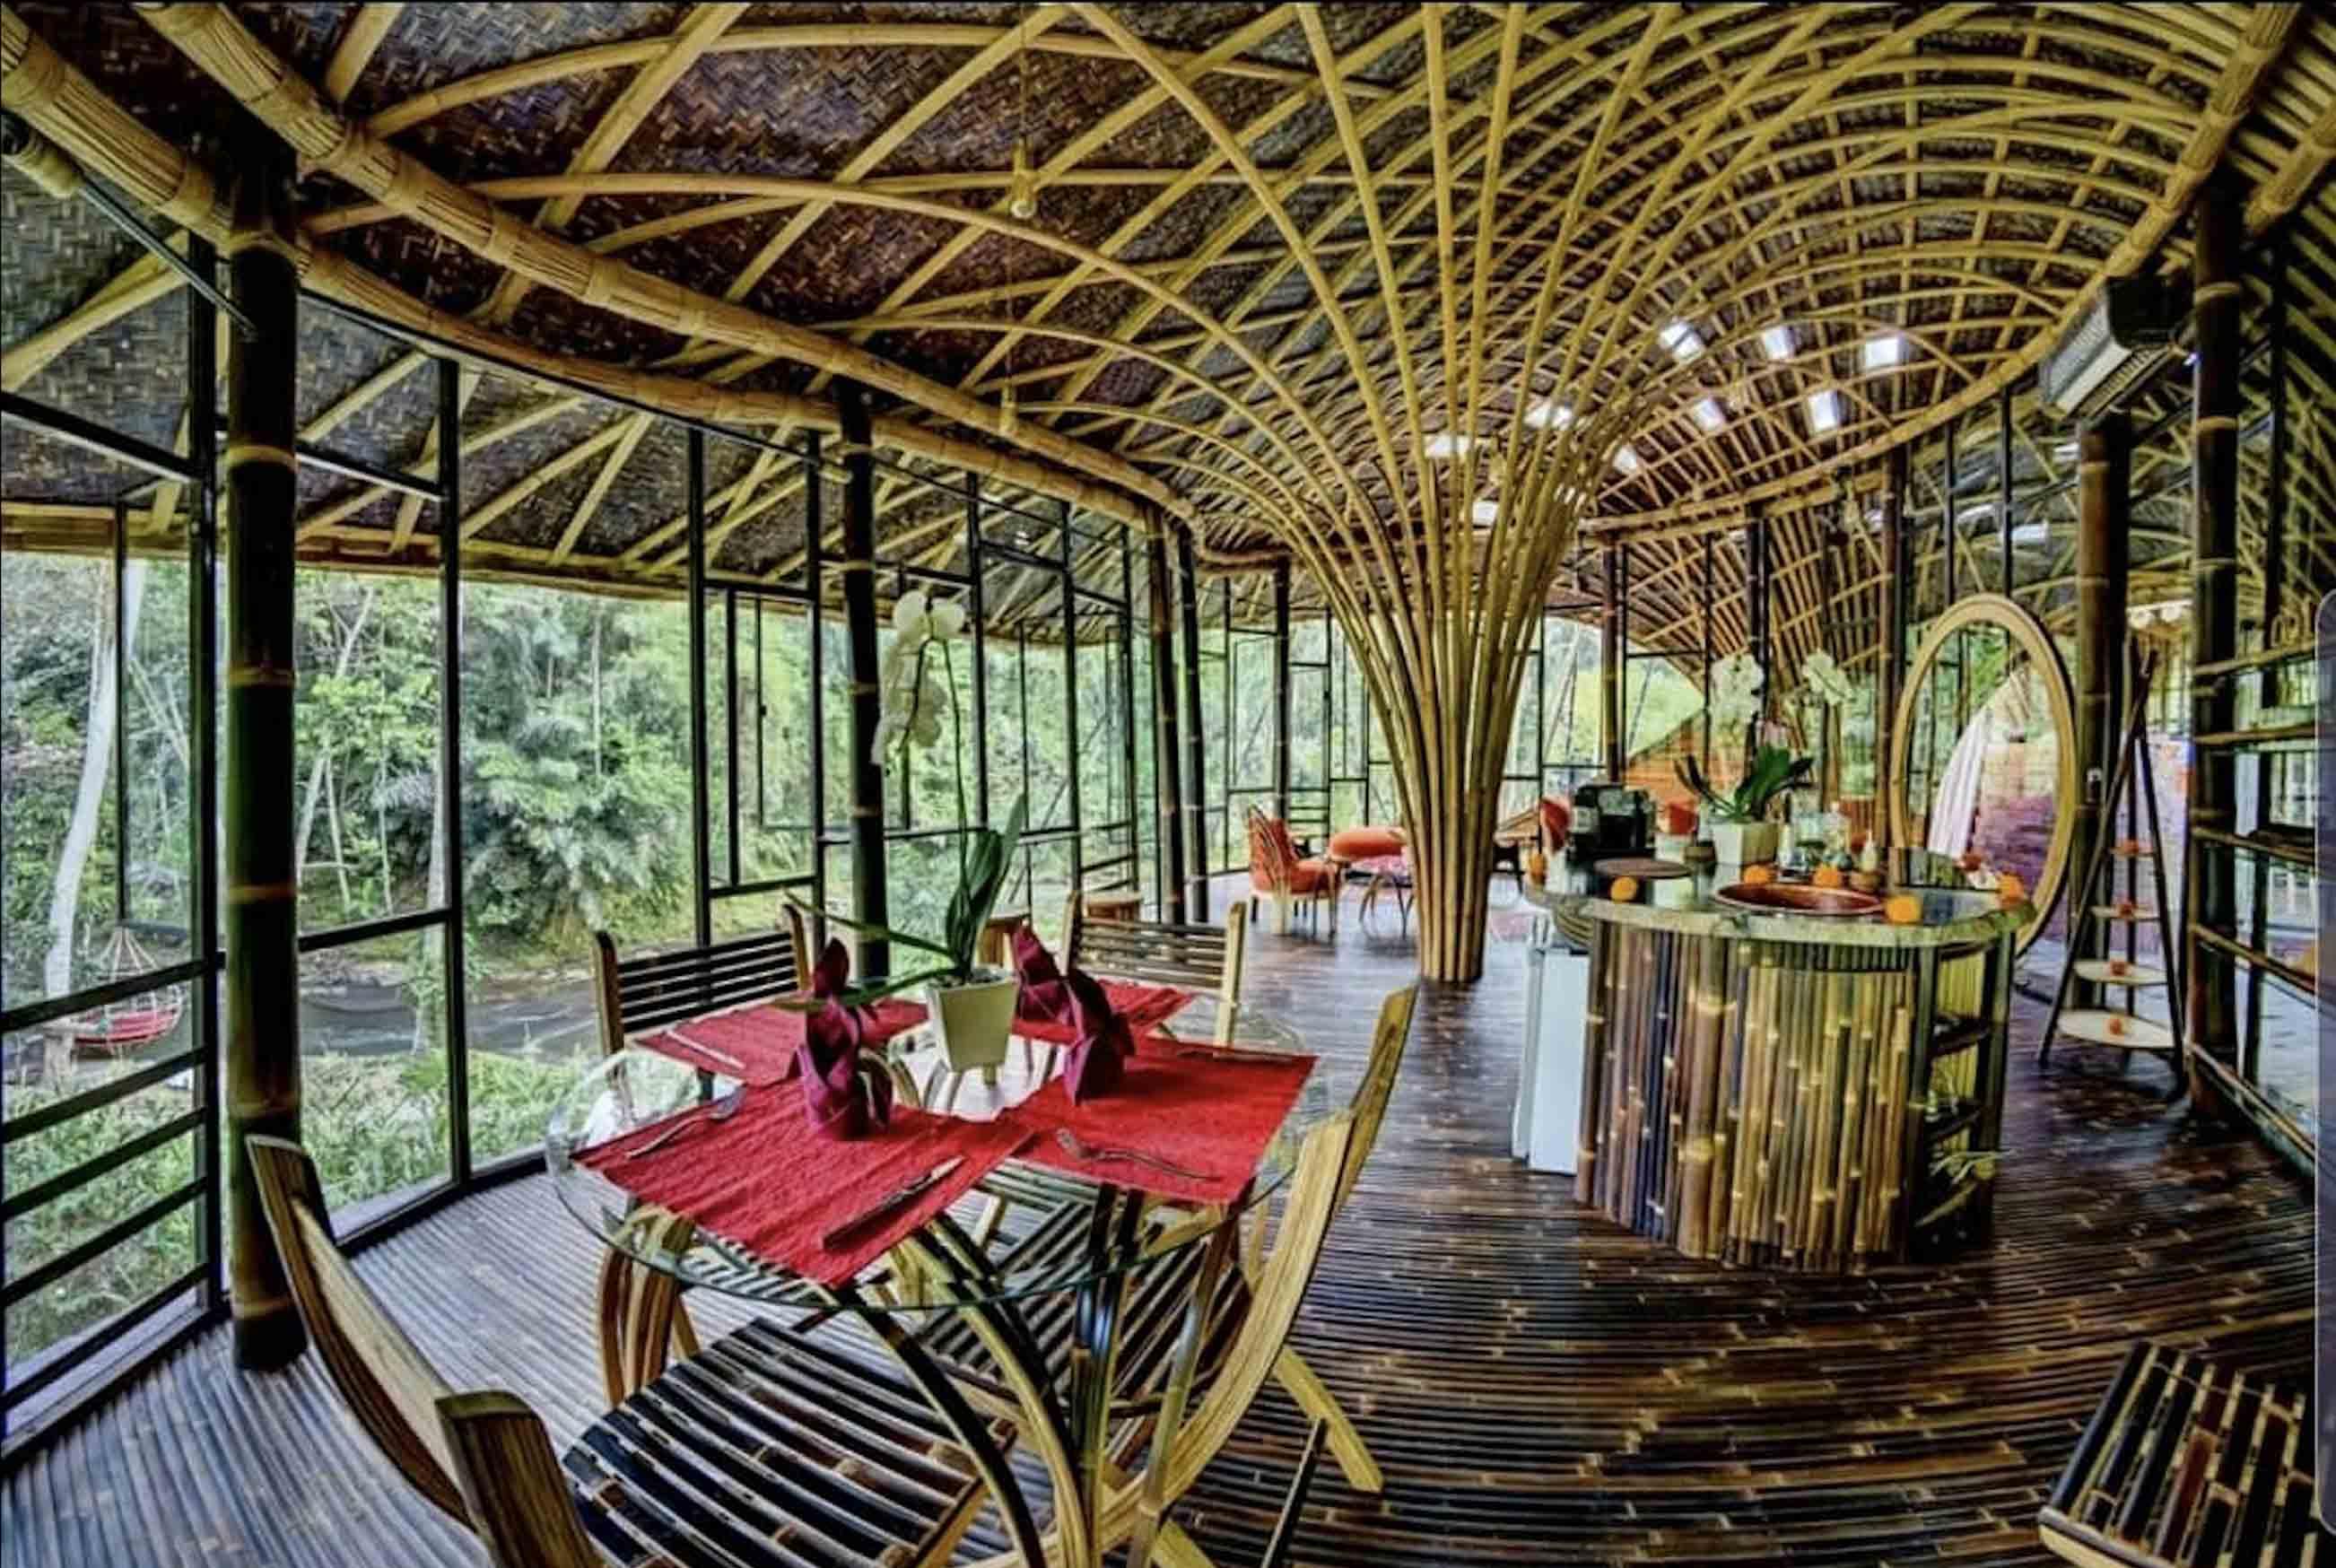 Agung Budi Raharsa   Architecture & Engineering Riverbend Bamboo House - Bali Bali, Indonesia Bali, Indonesia Agung-Budi-Raharsa-Riverbend-House-Bali   88714